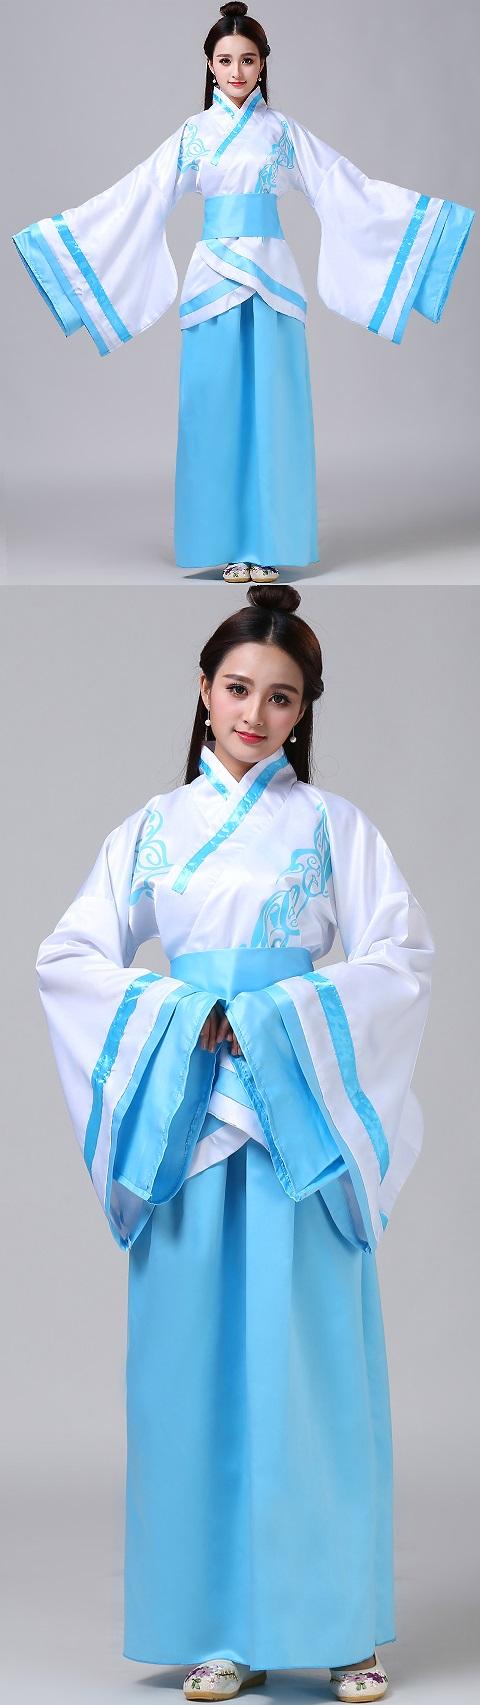 Chinese Traditional Dress - Folkwear Hanfu (RM)